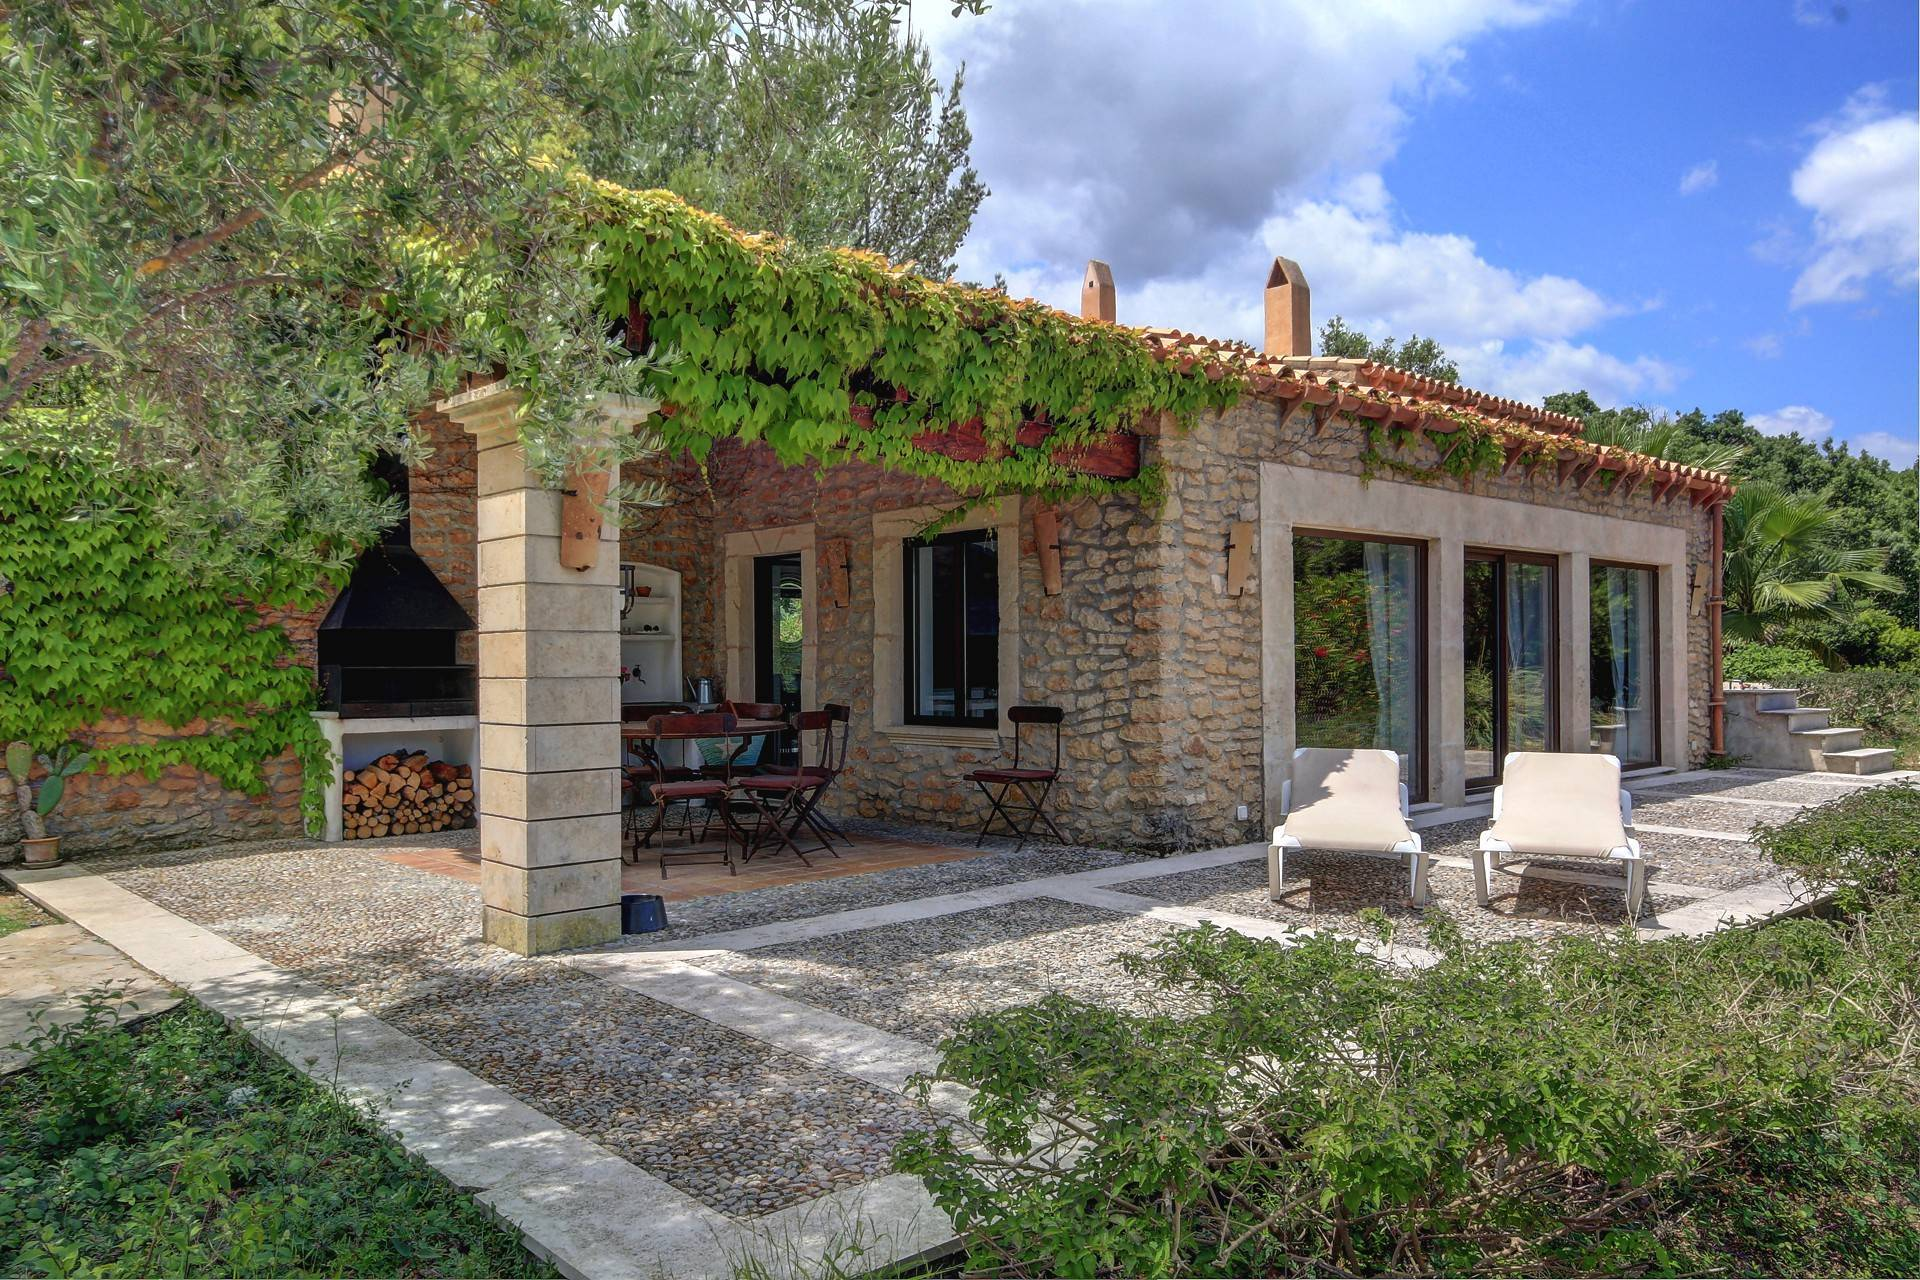 01-56 charmante Finca Mallorca Nordosten Bild 5